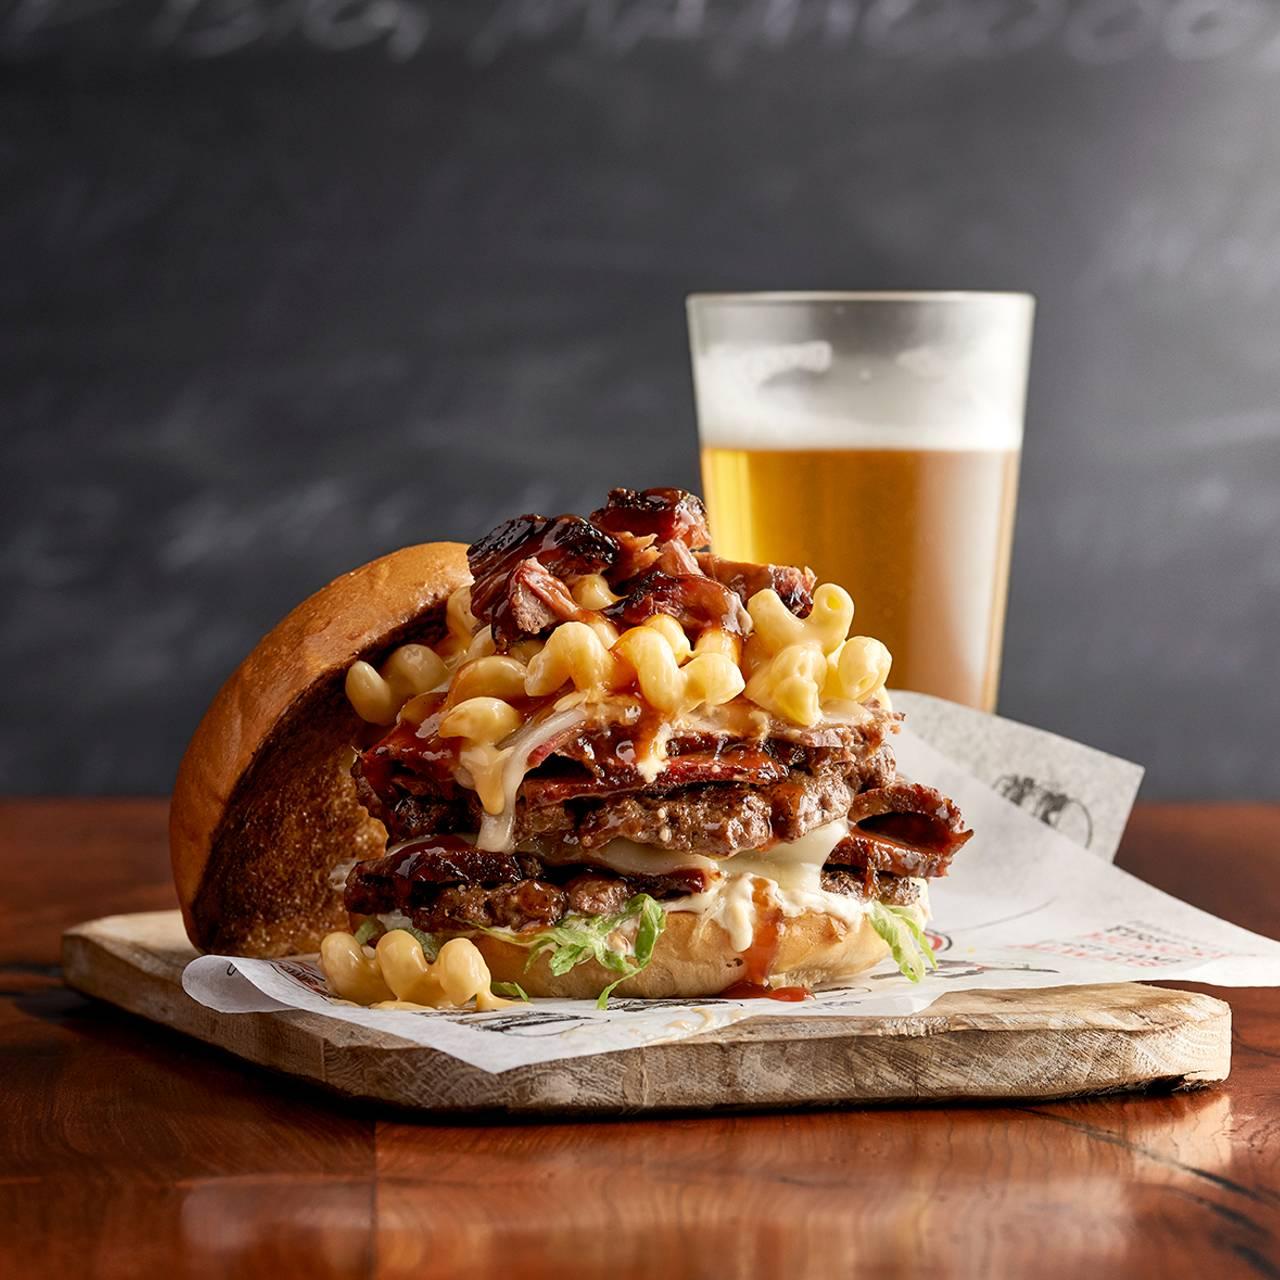 Bill S Bar And Burger Restaurant New York Ny Opentable